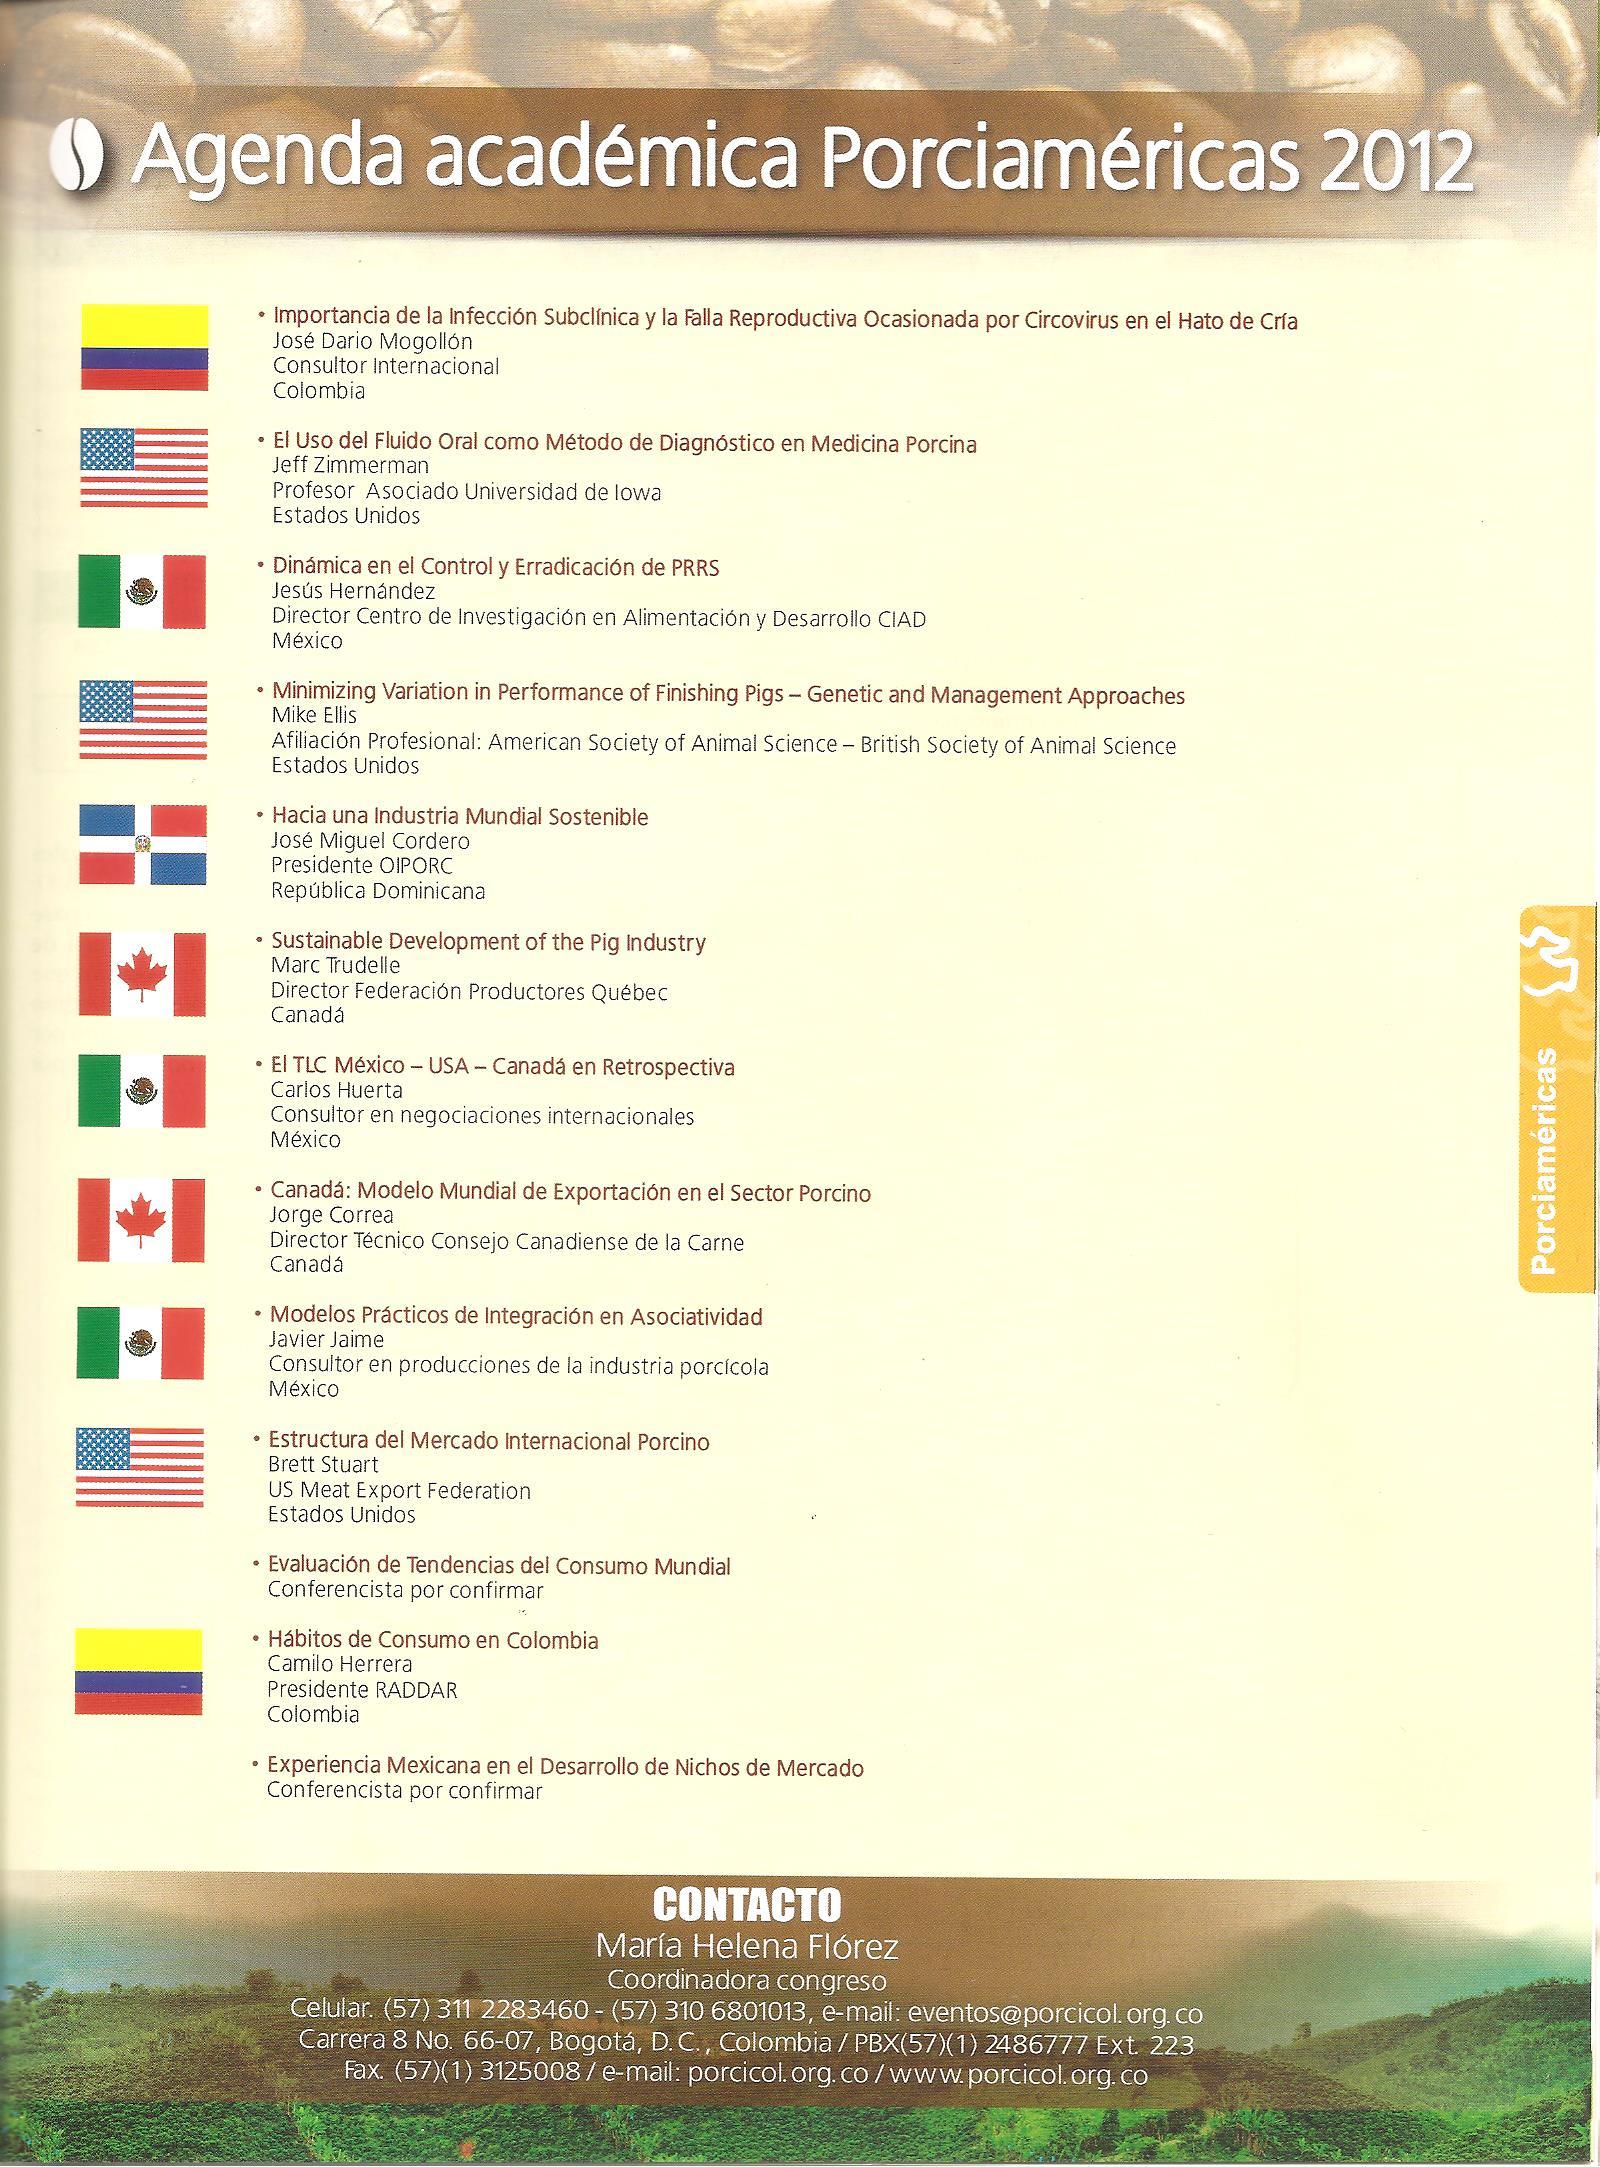 https://www.porkcolombia.co/wp-content/uploads/2018/07/agenda_porciamericas_2012.jpg